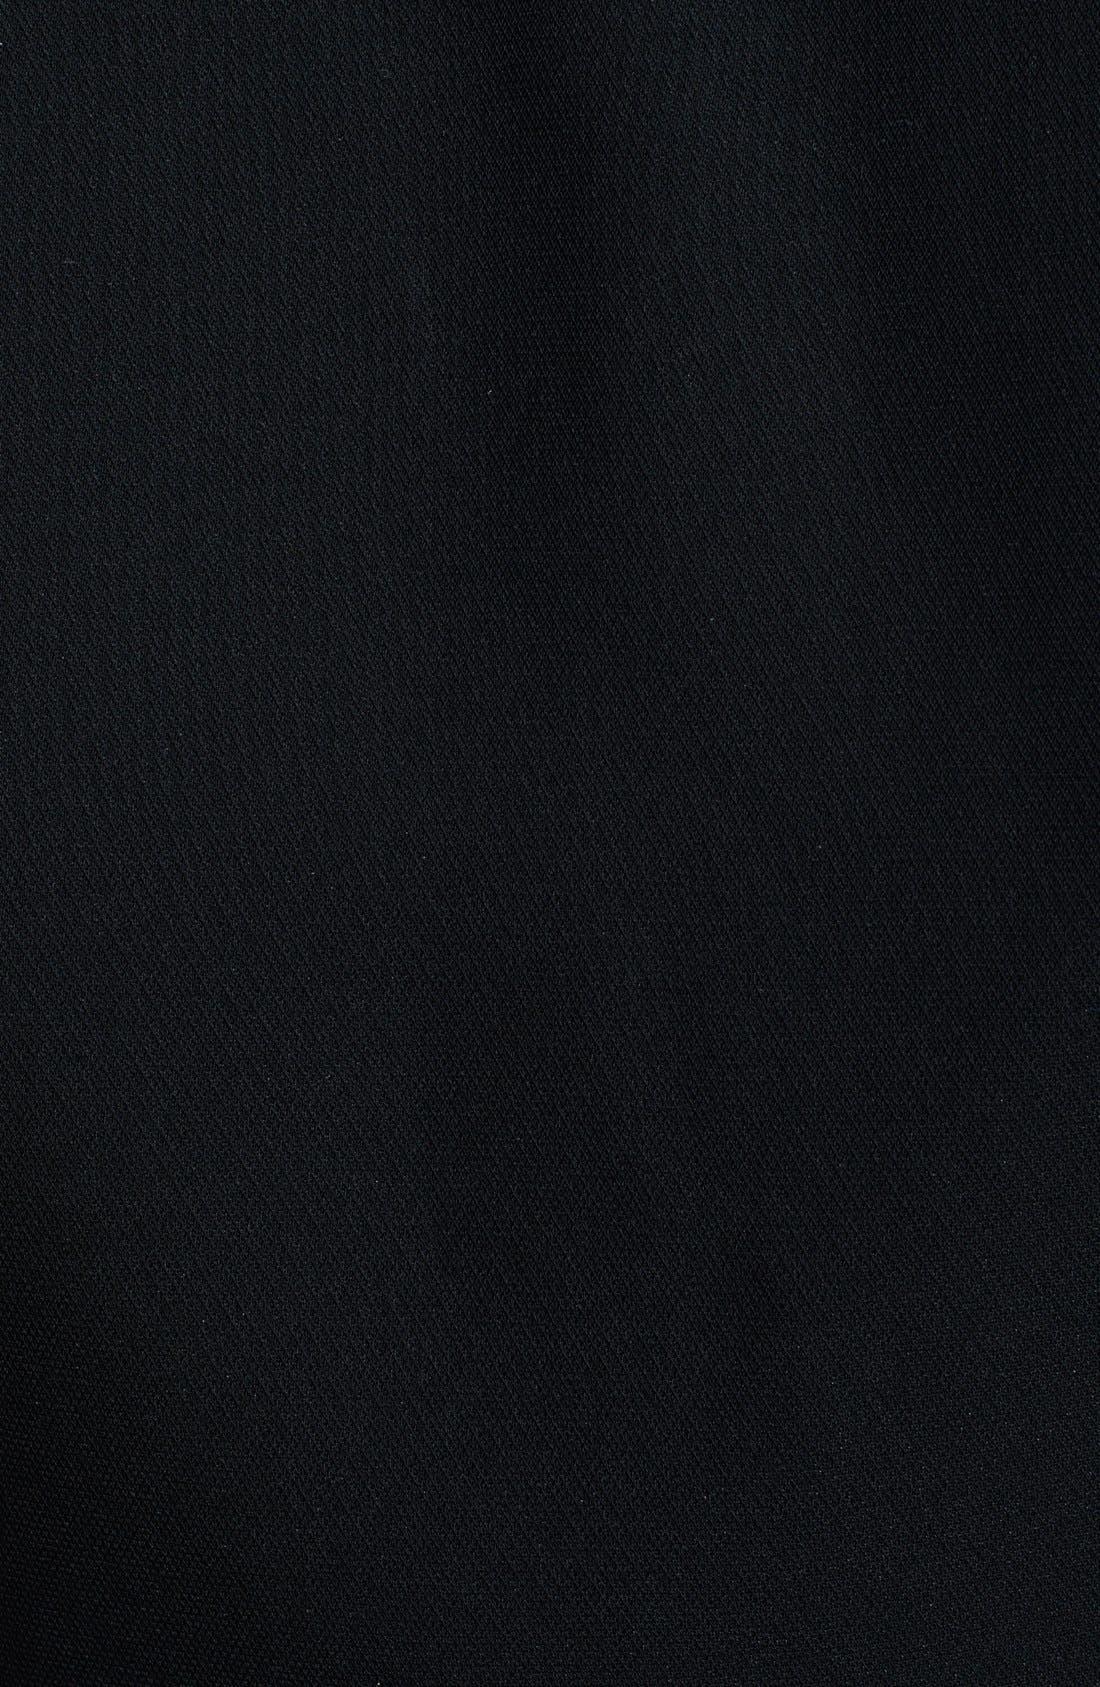 THE KOOPLES, Cutout Crepe Dress, Alternate thumbnail 3, color, 001